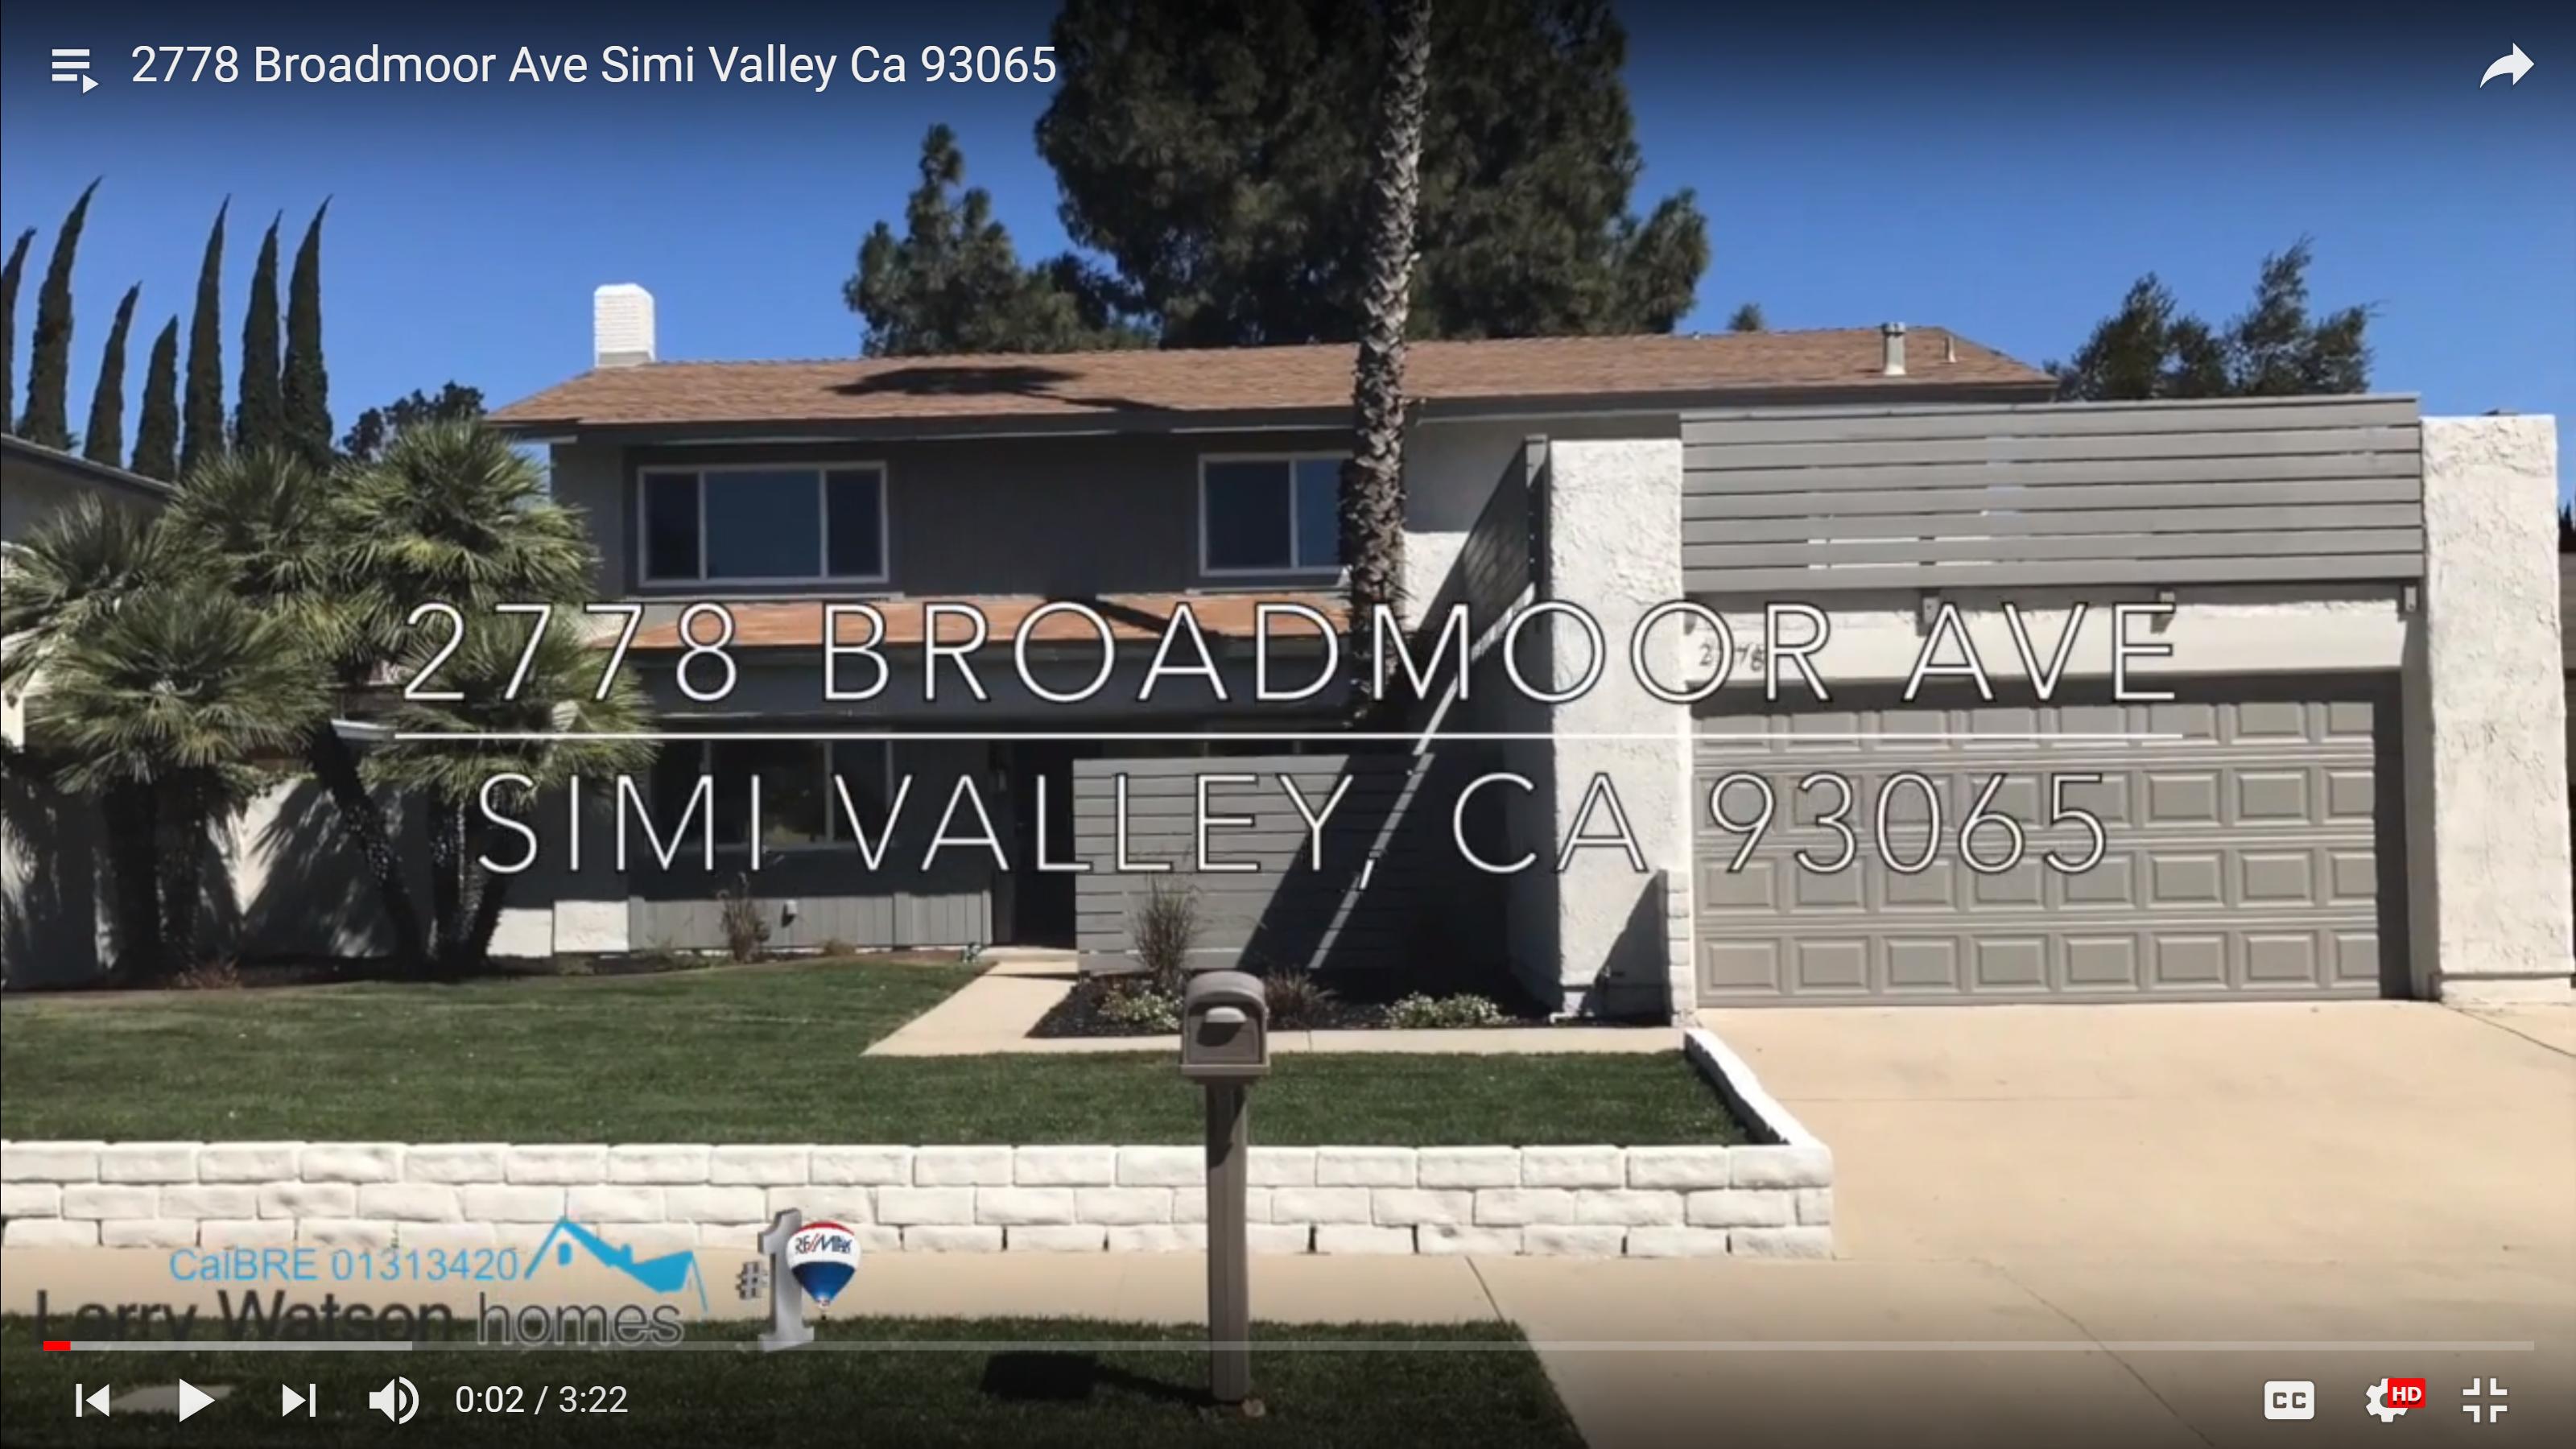 2778 Broadmoor Ave Simi Valley Ca 93065